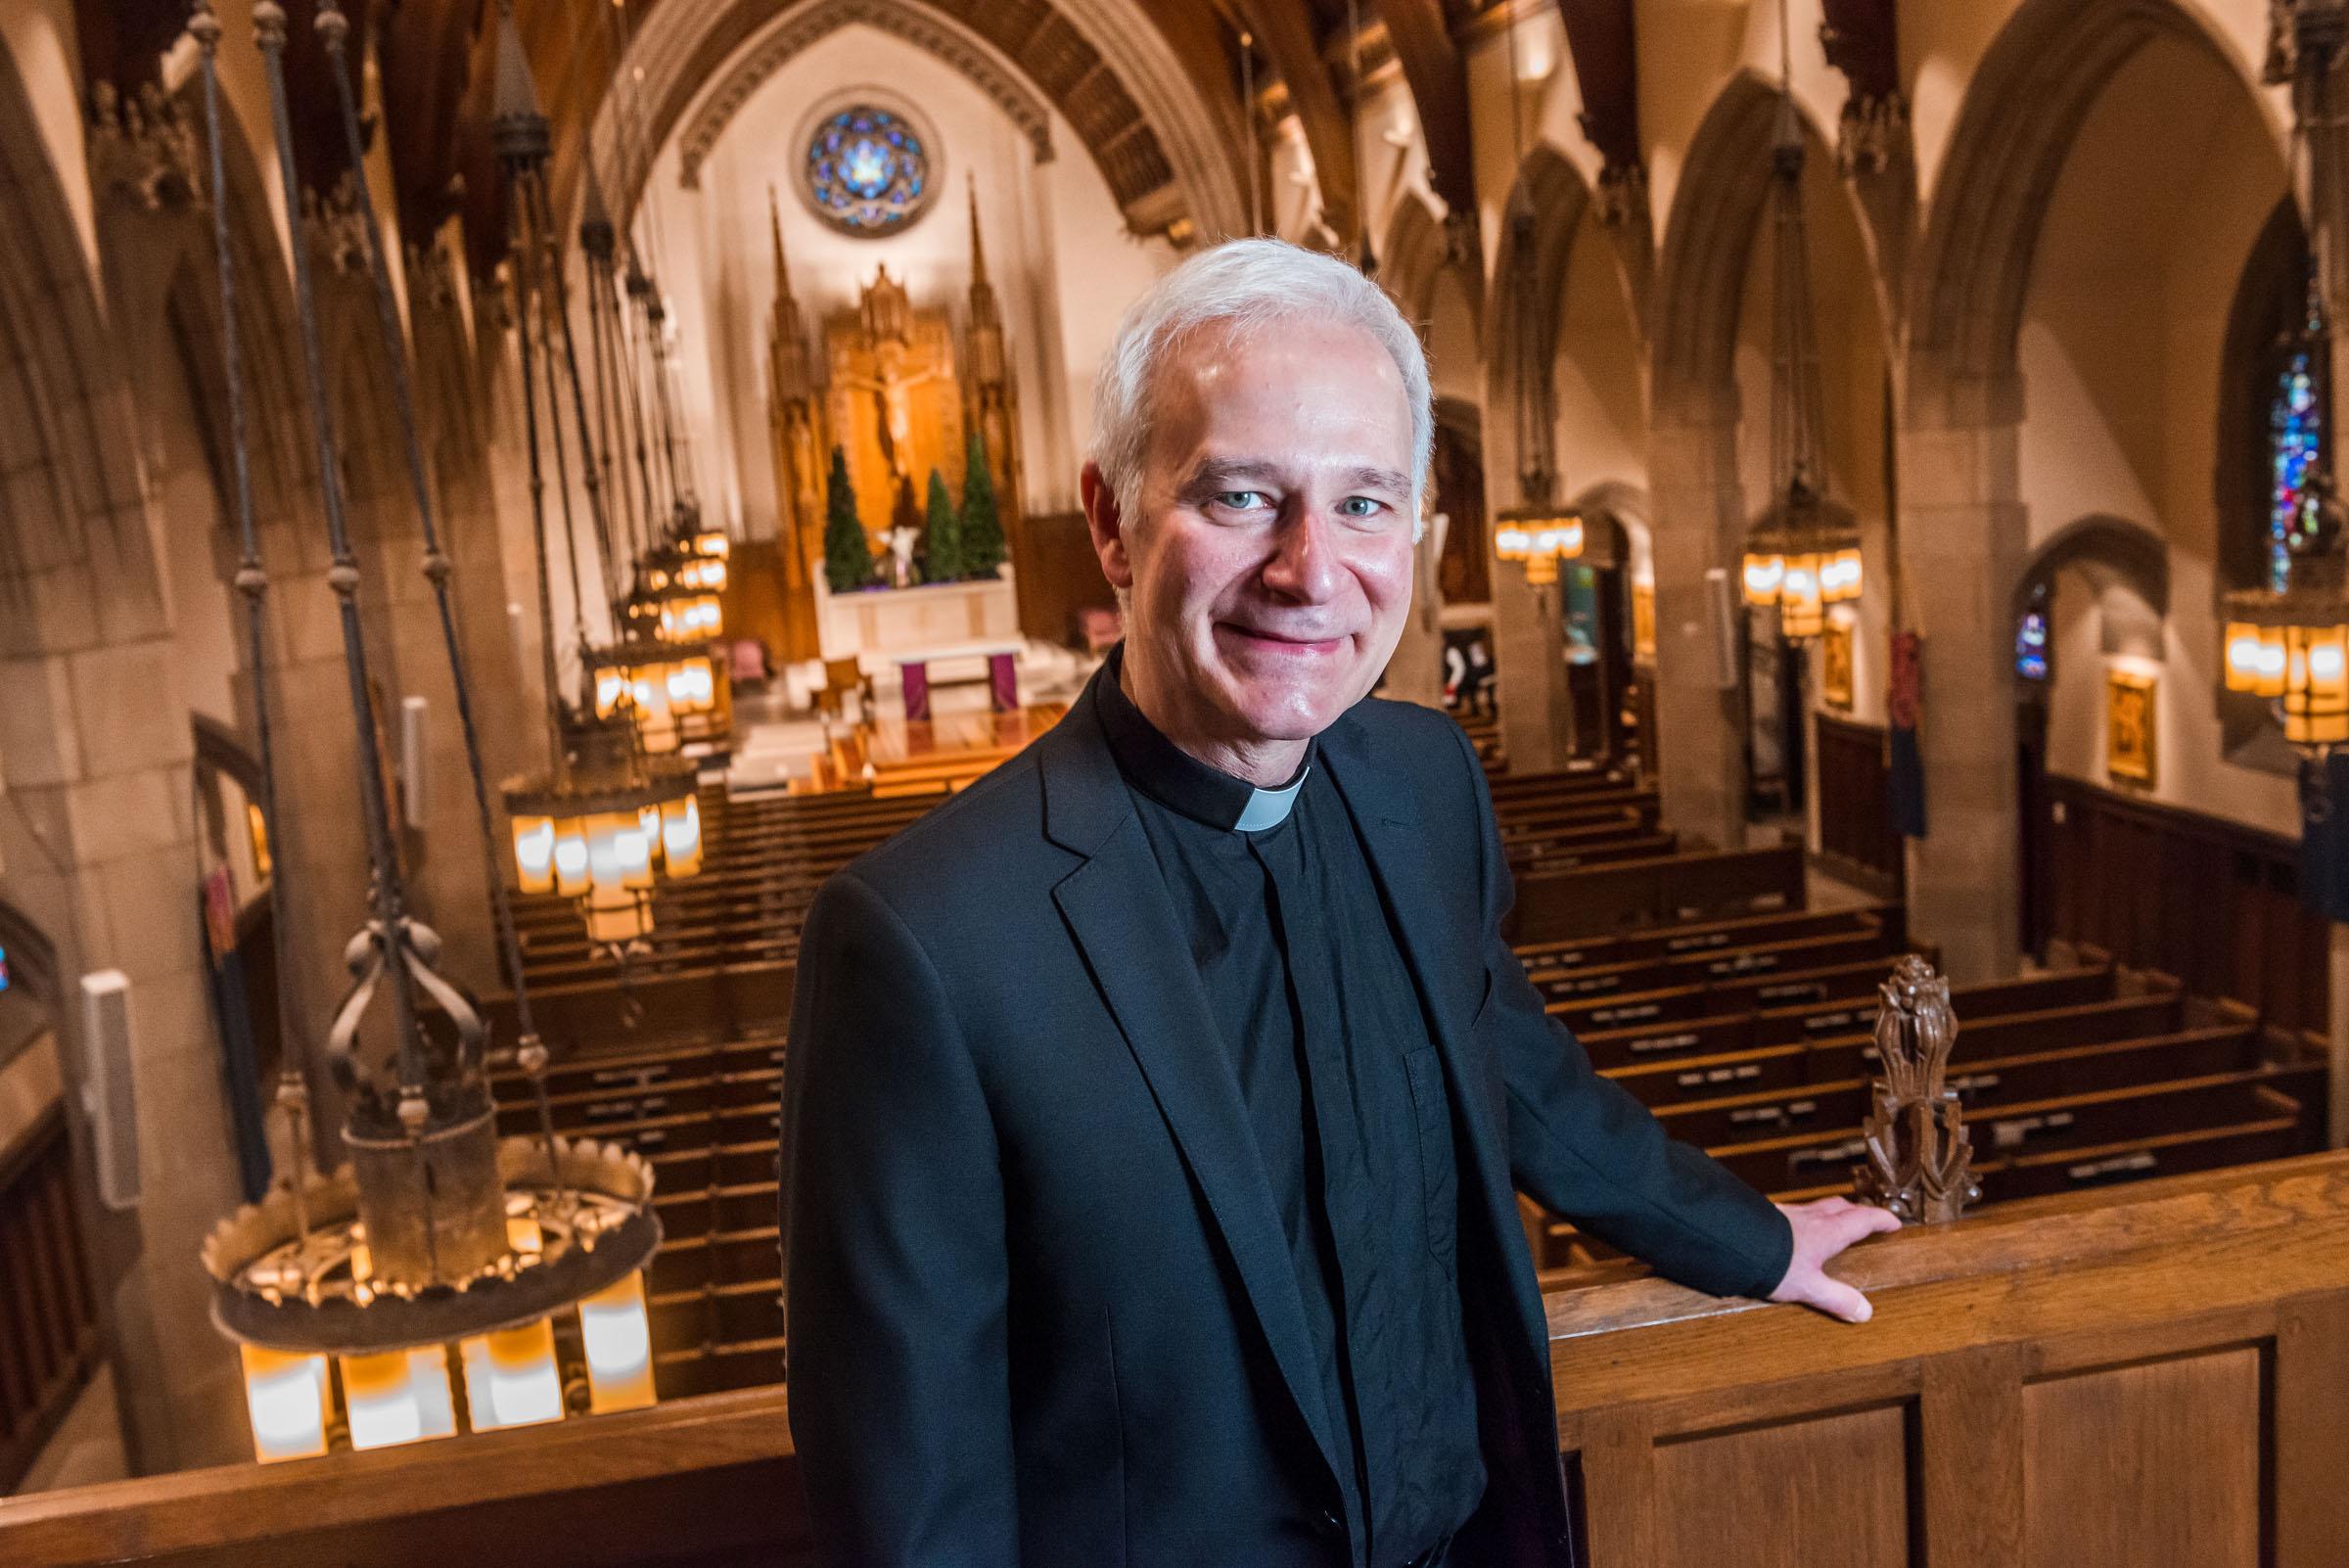 Rev. Joseph Costantino, S.J., Pastor of  ST. IGNATIUS CHURCH in CHESTNUT HILL, MA (Photo by Gary Gilbert, Boston College)